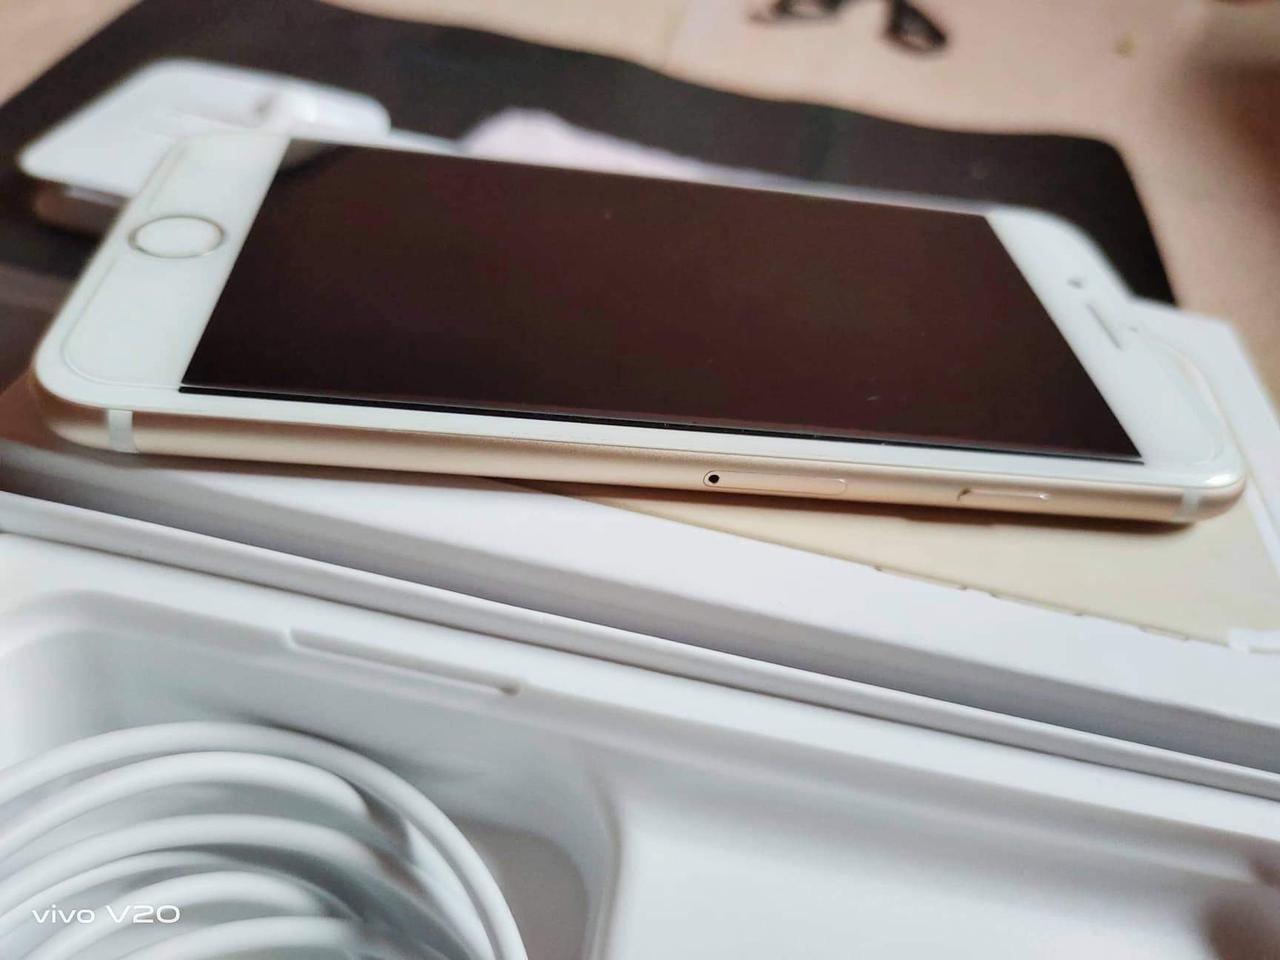 iPhone7 มือสอง 128G สีทอง รูปที่ 5